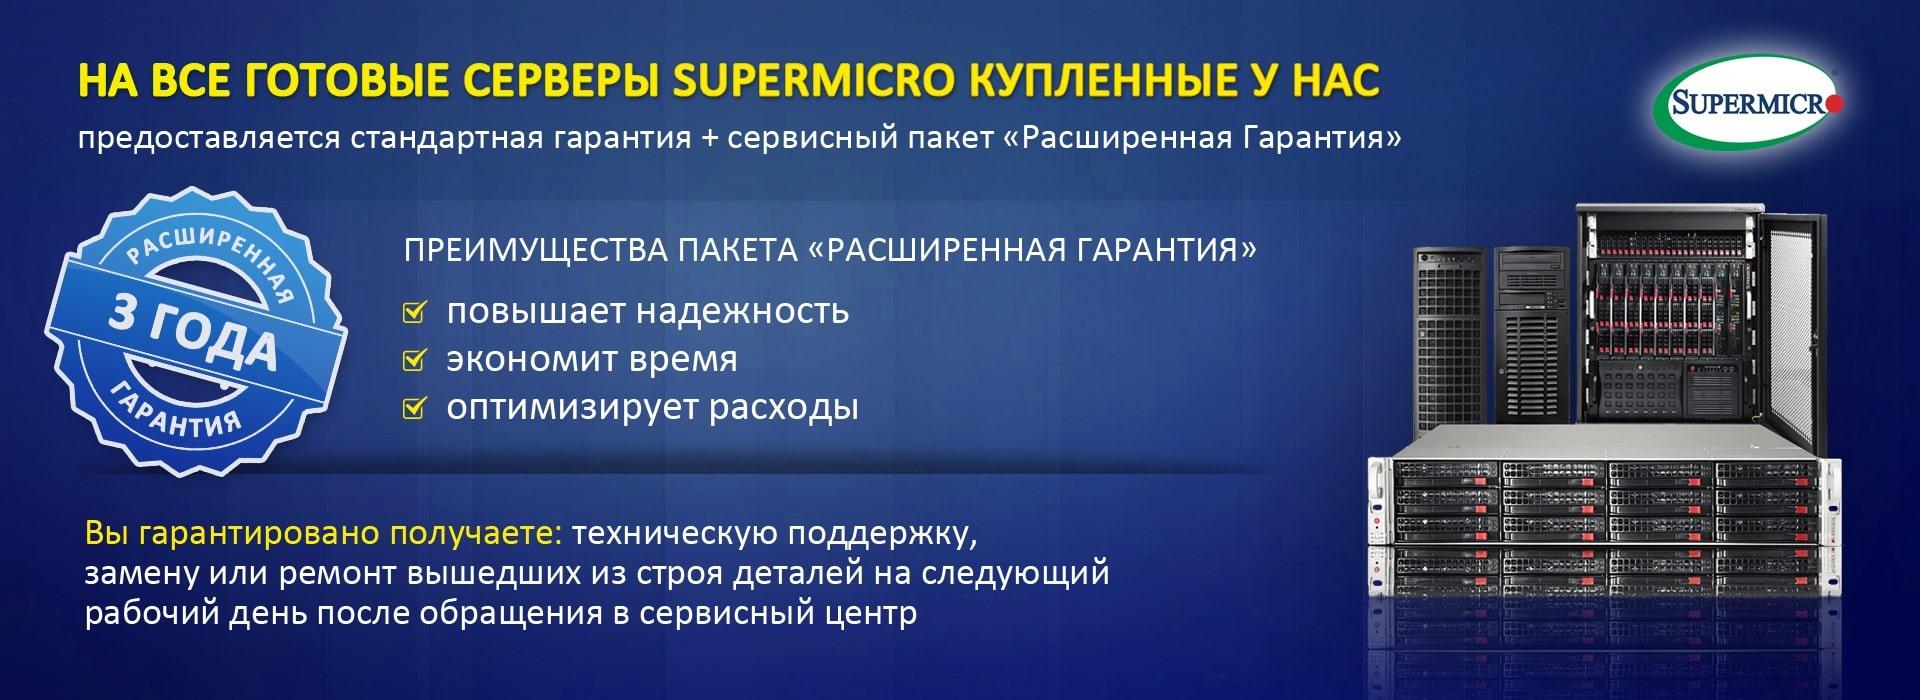 Расширенная гарантия Supermicro